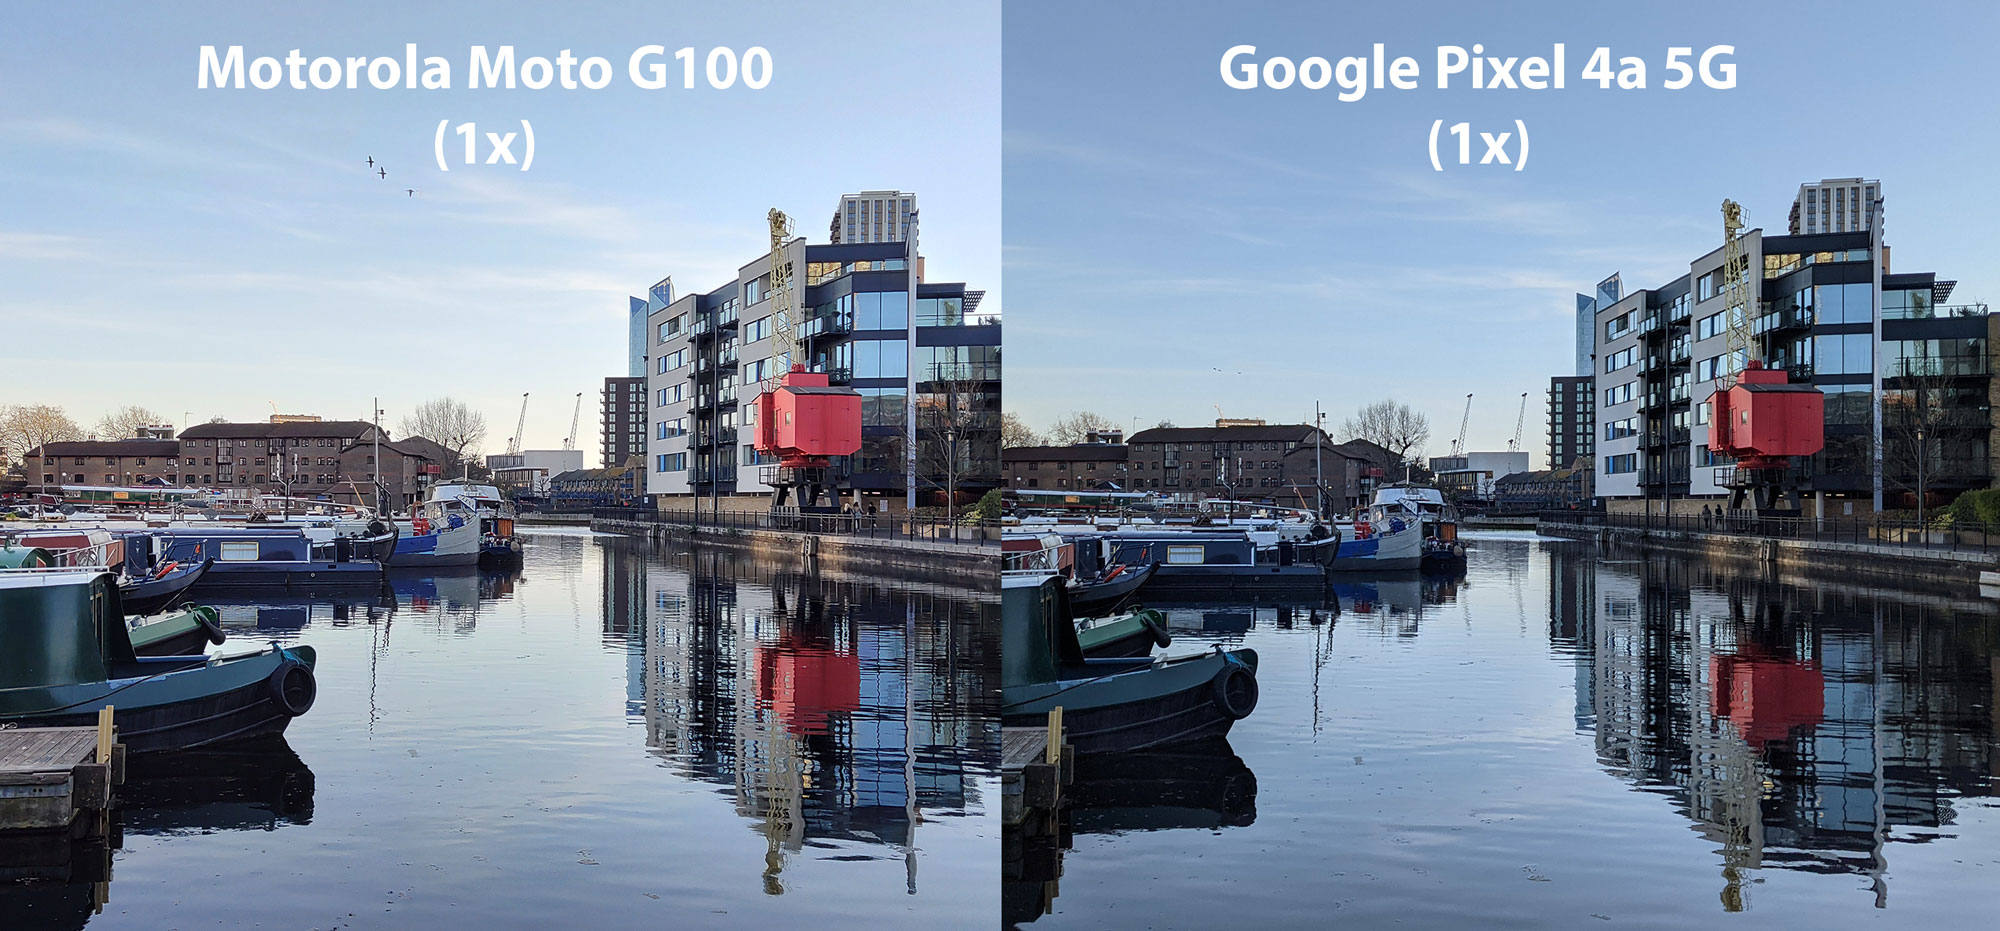 moto-g100-camera-comaprison-google-pixel-4a-5g-5.jpg